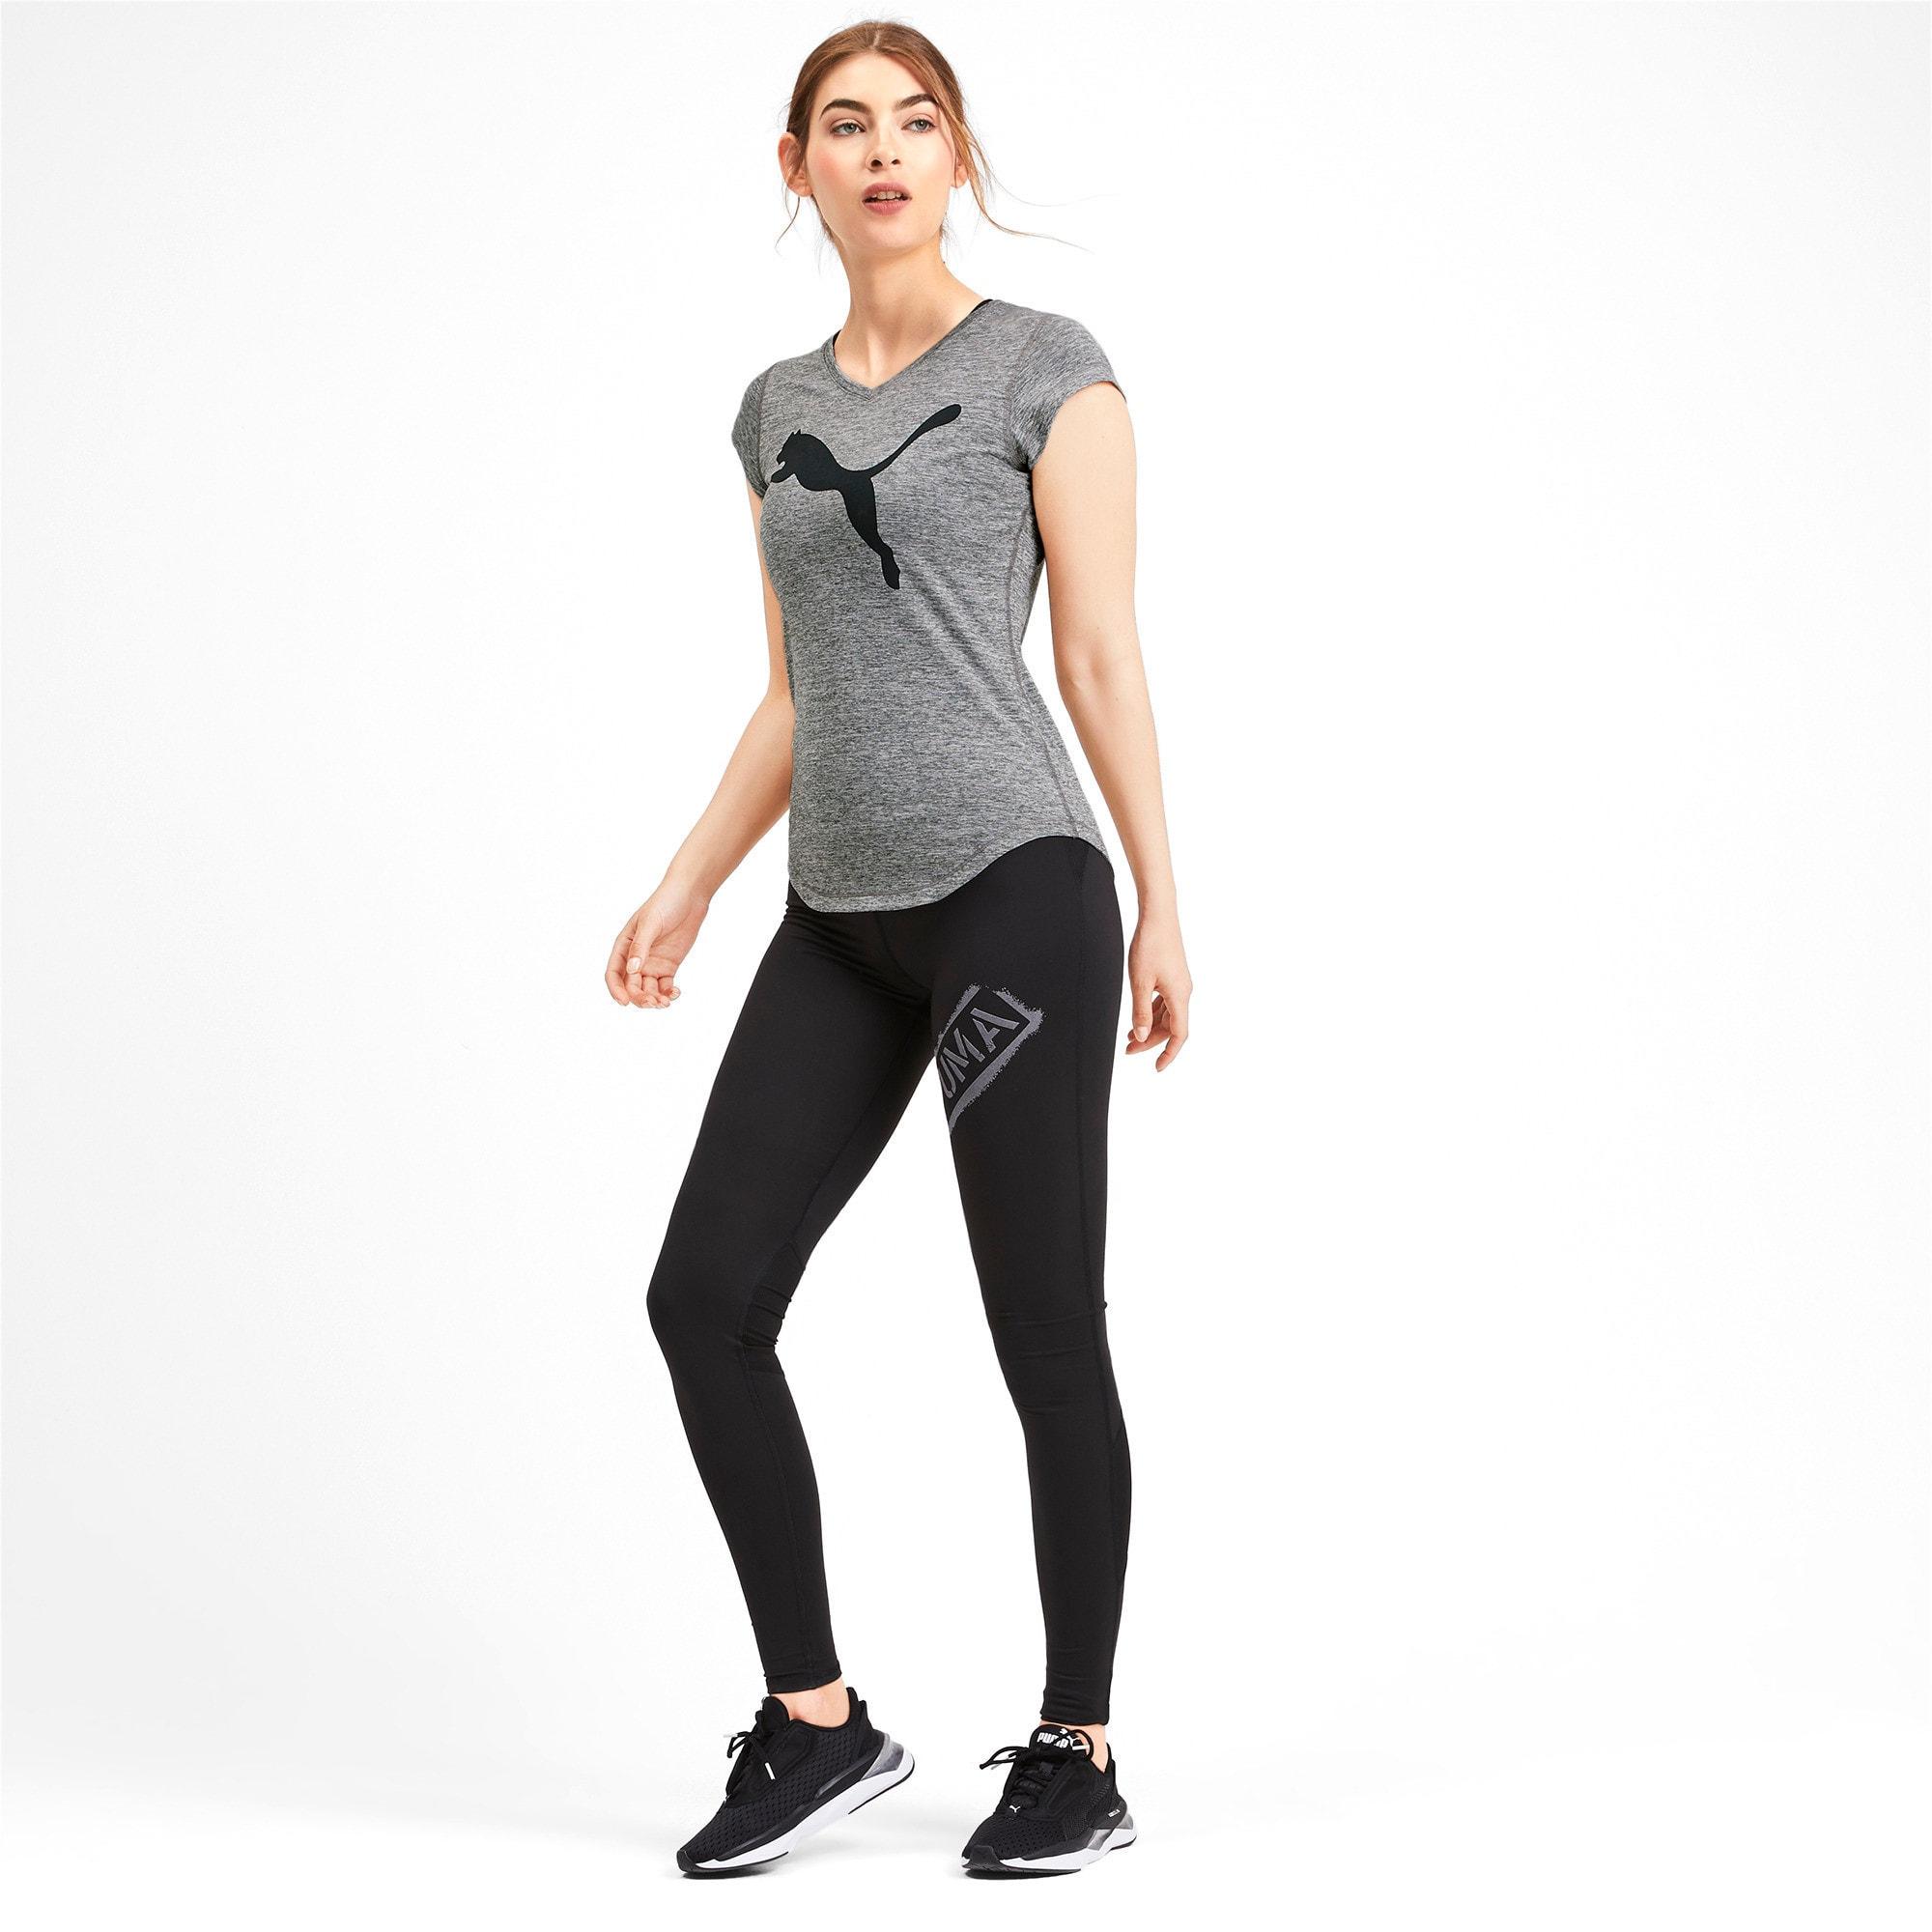 Thumbnail 3 of ヘザー キャット ウィメンズ ランニング Tシャツ 半袖, Medium Gray Heather, medium-JPN